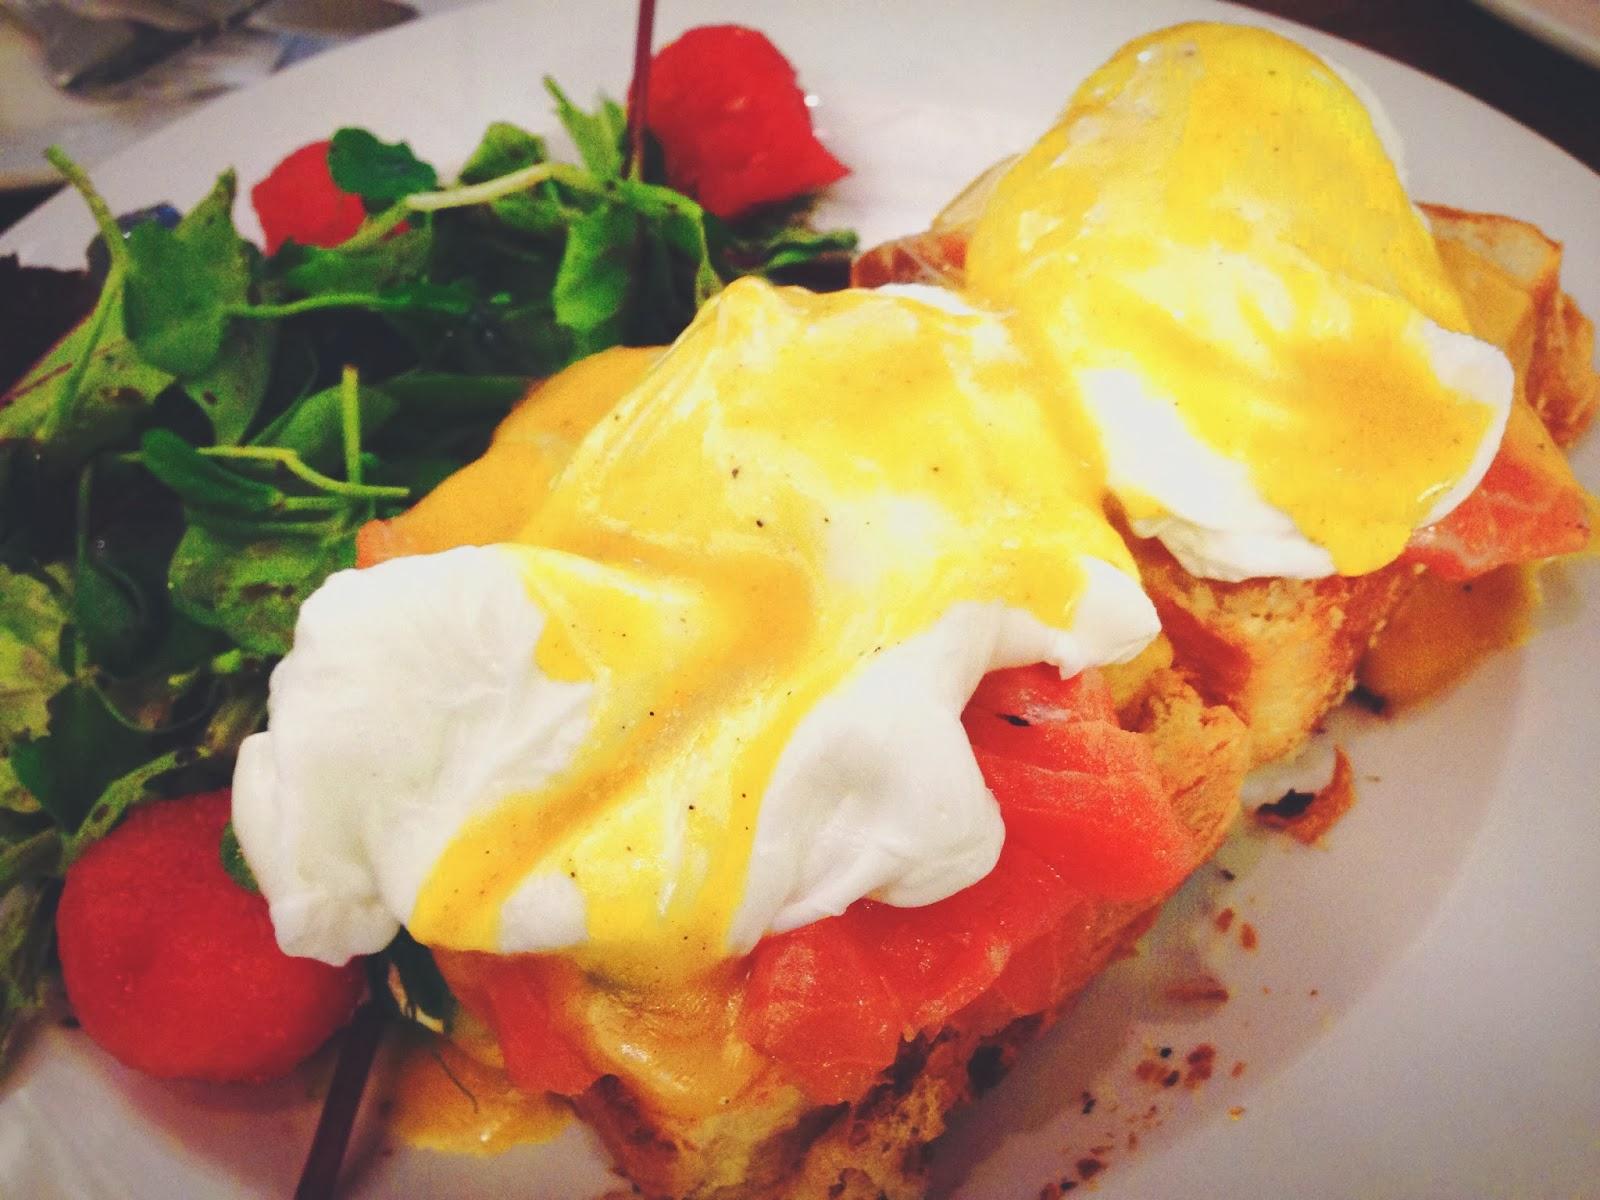 Maison Ikkoku Salmon Florentine All-Day Breakfast